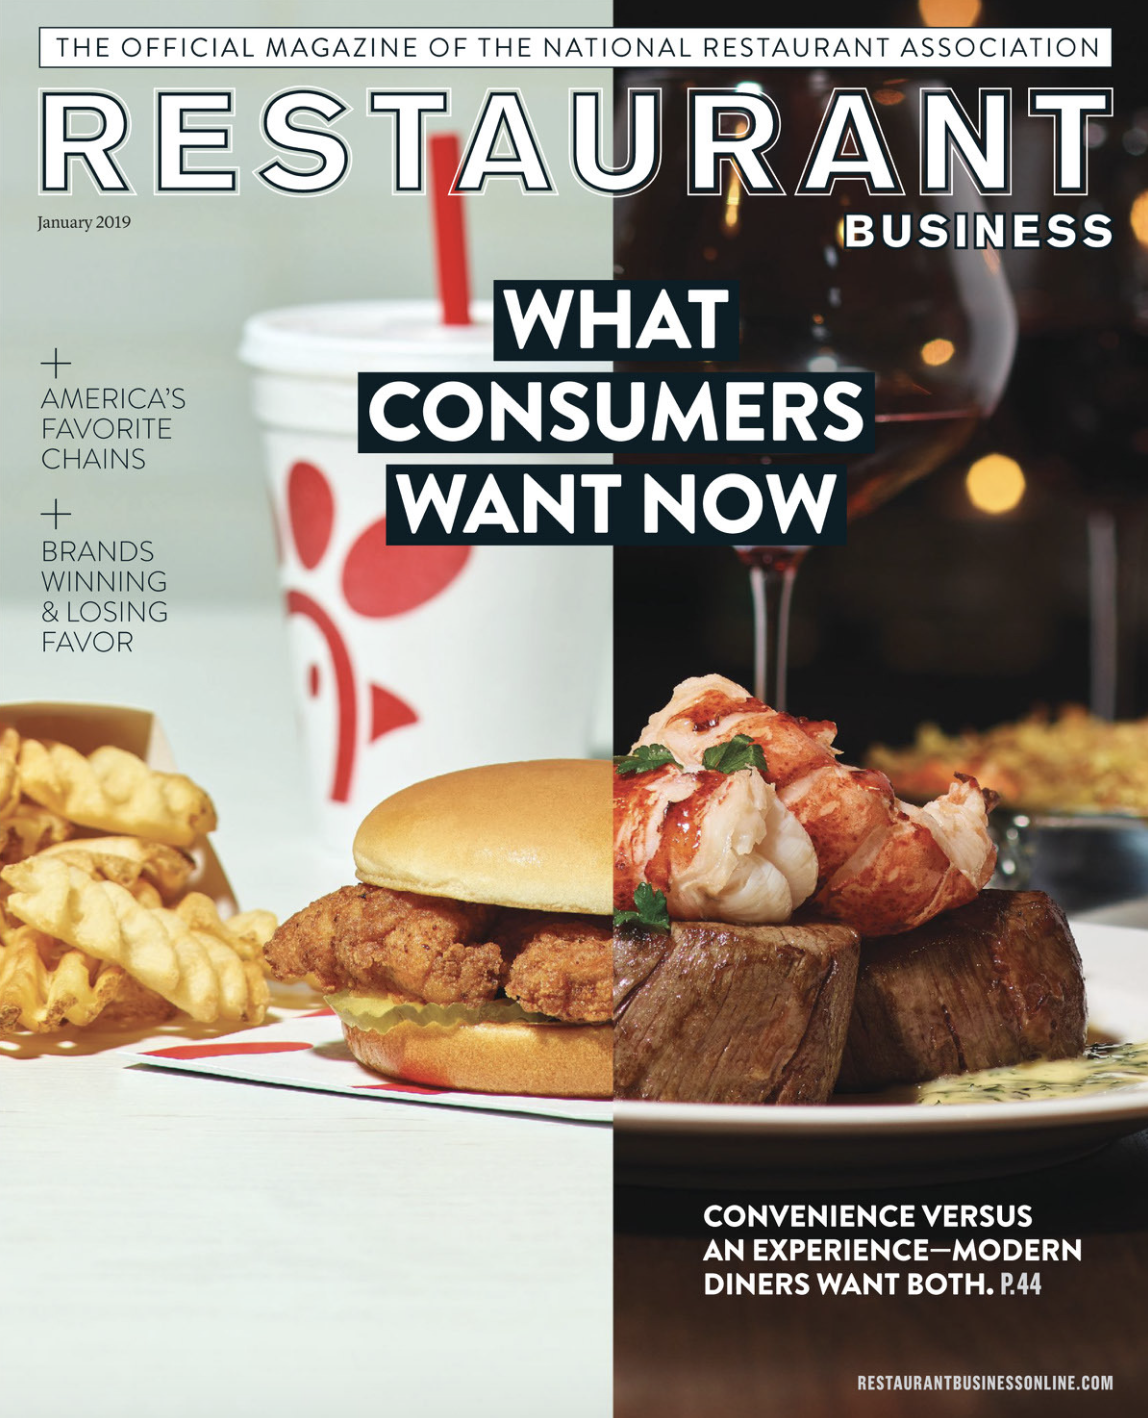 Restaurant Business Magazine January 2019 Issue